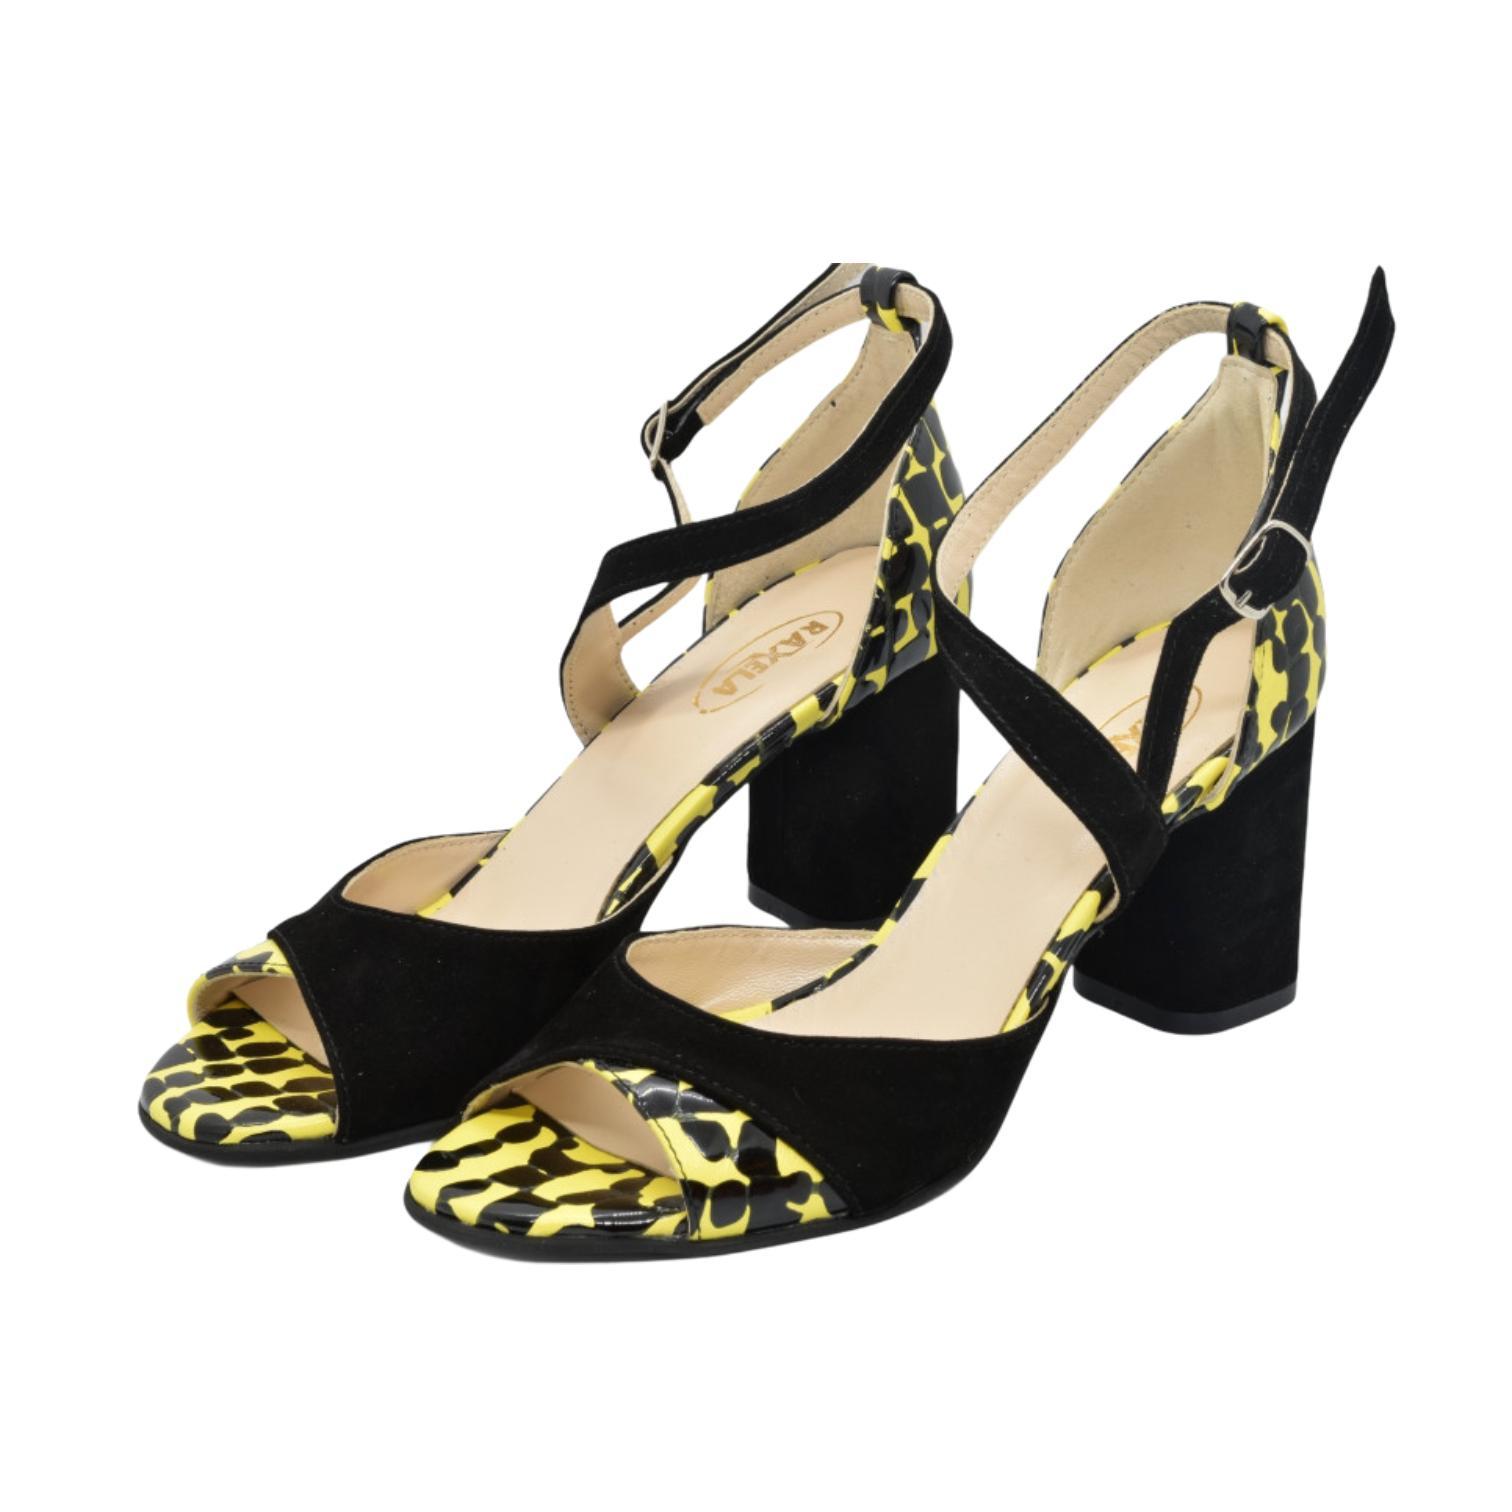 Sandale negre combinate cu galben